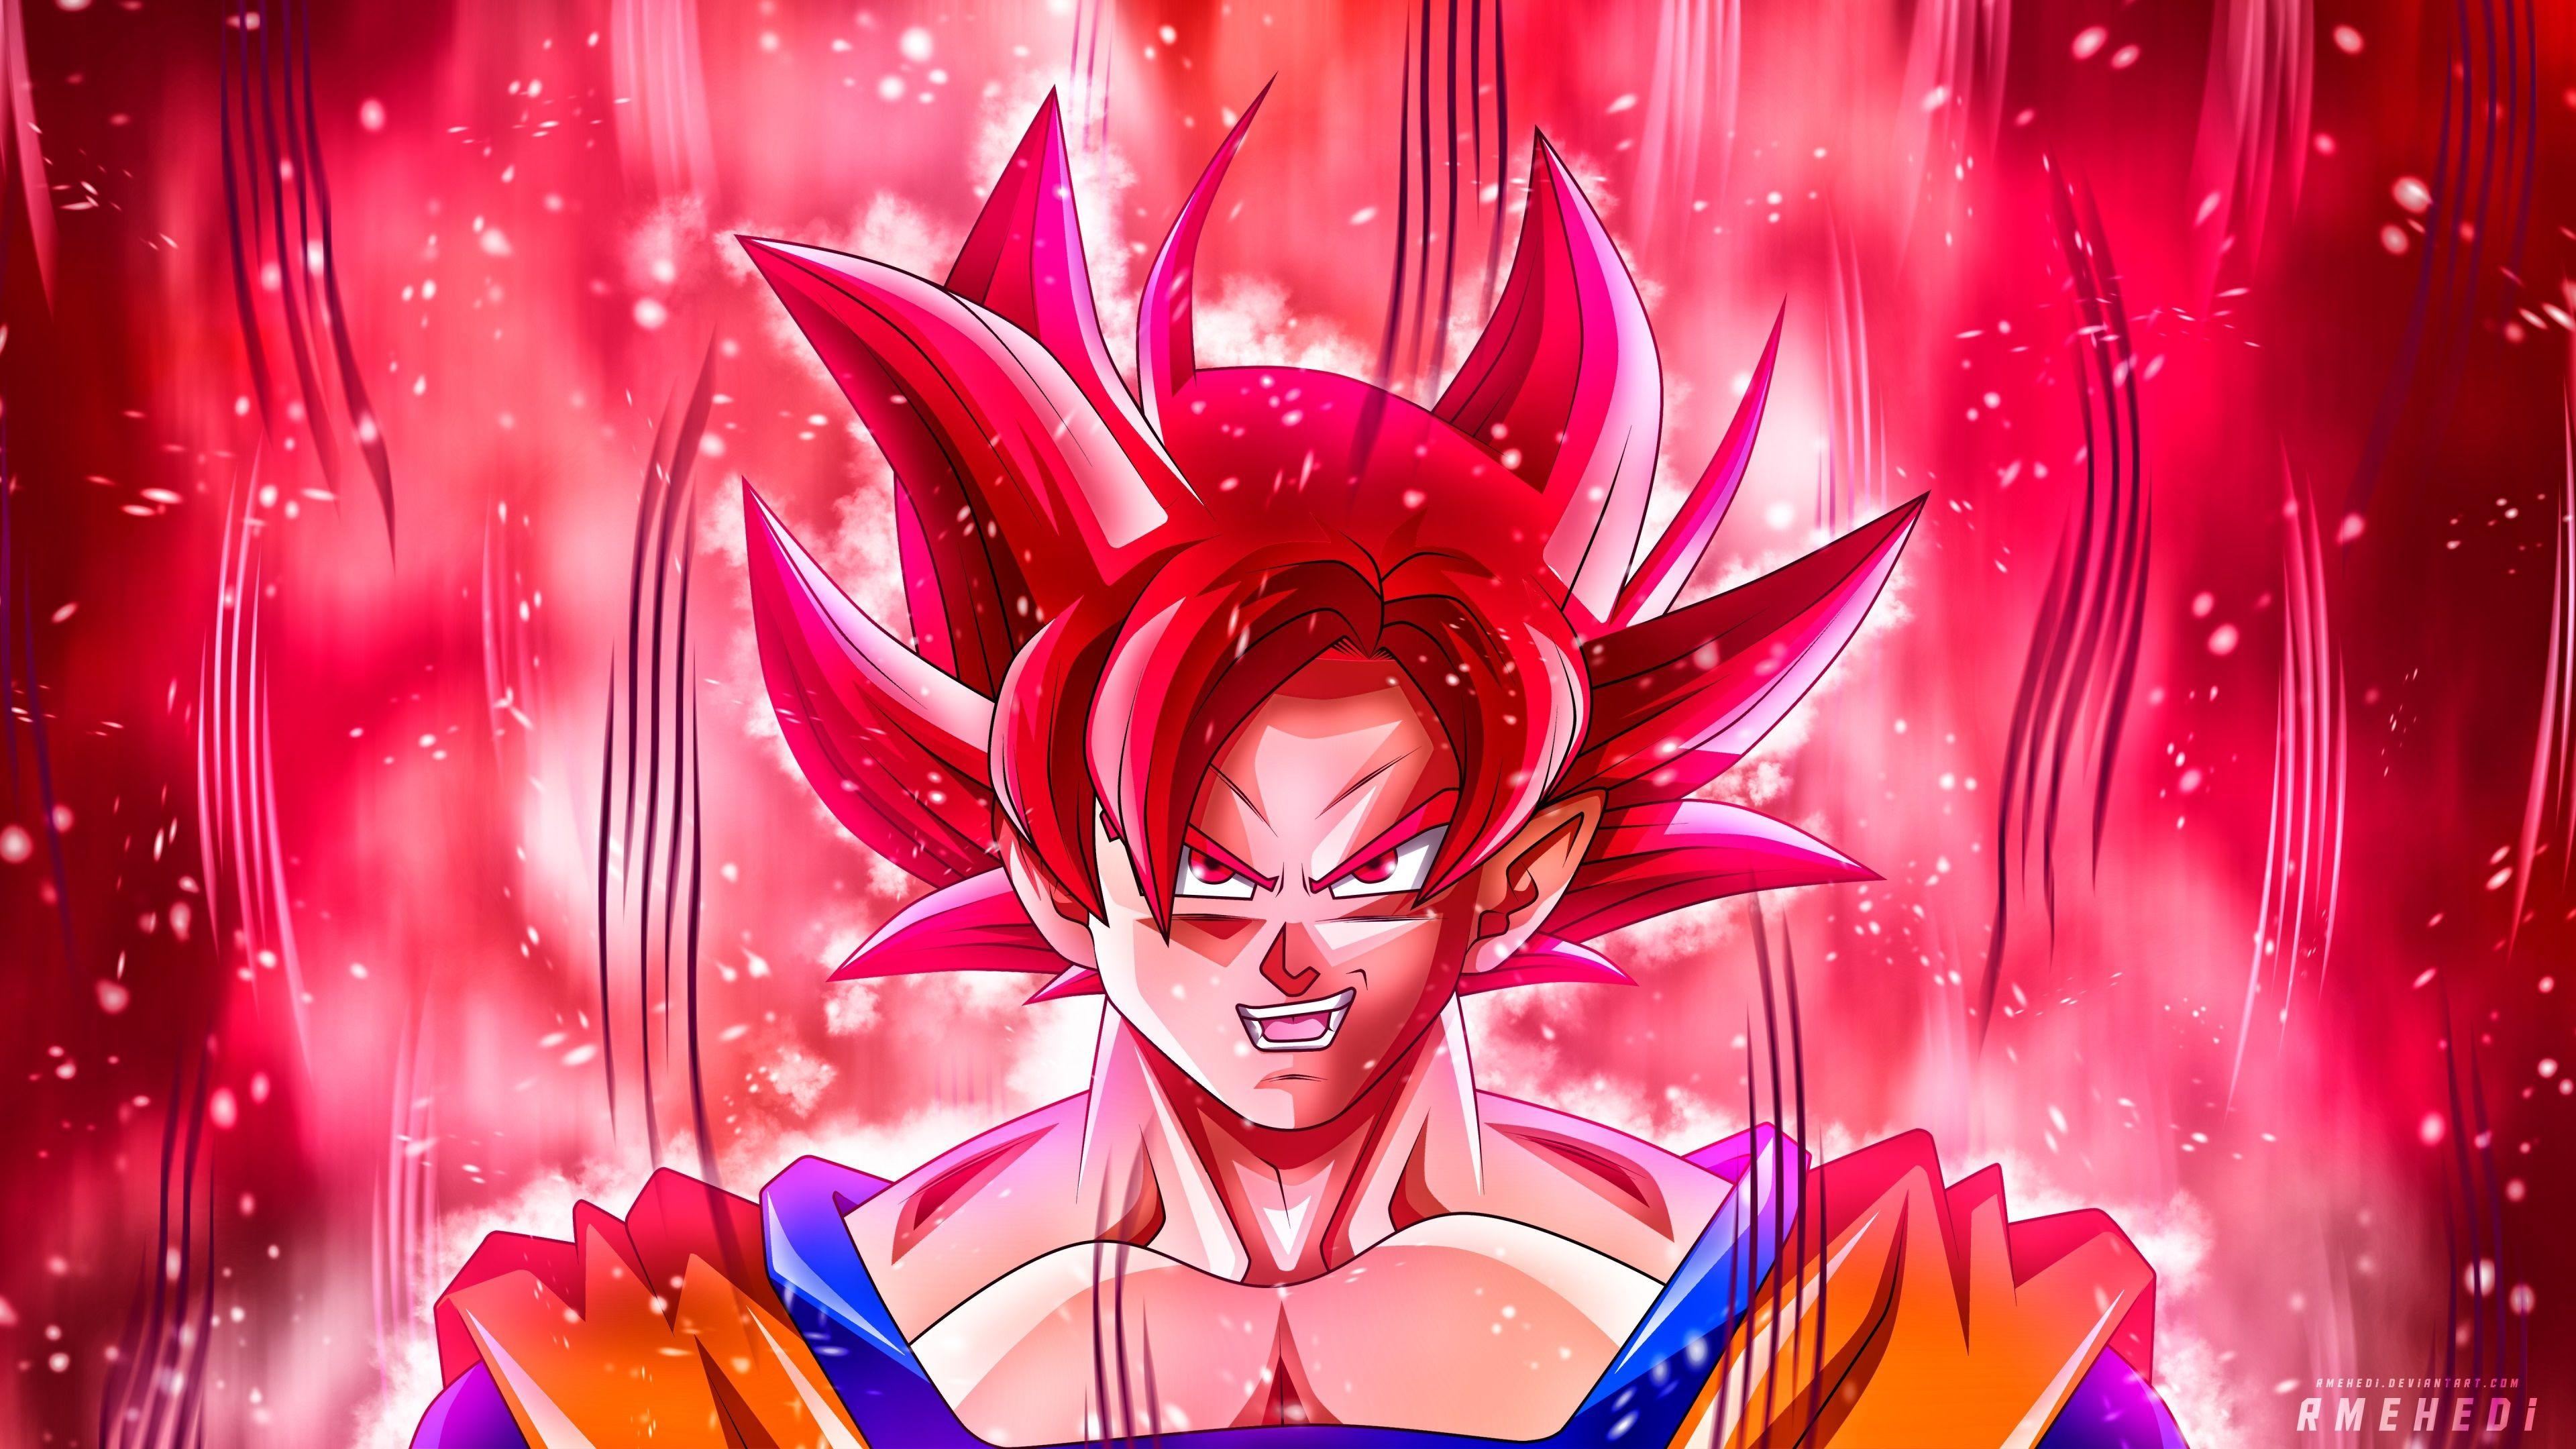 3840x2160 Goku 4k Wallpapers 1080p High Quality Goku